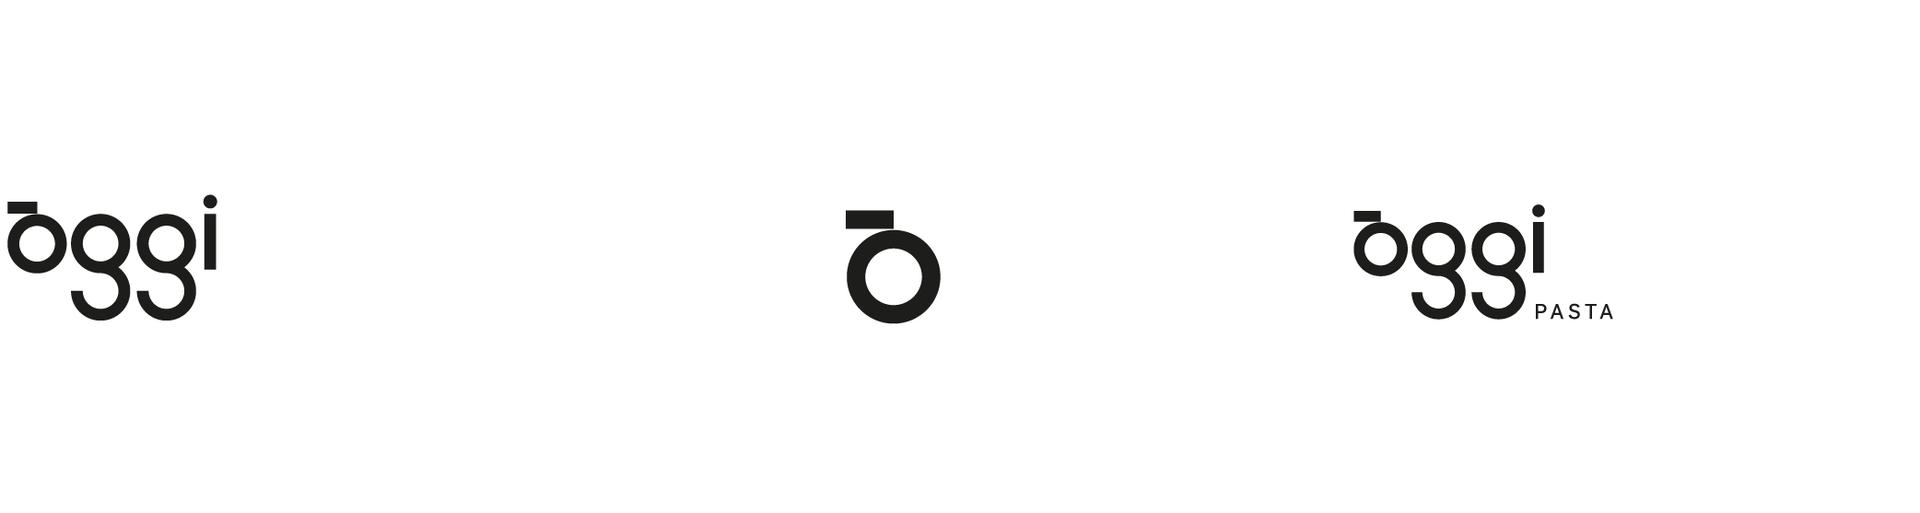 apoc_studio_gustavo_francesconi_logos_55